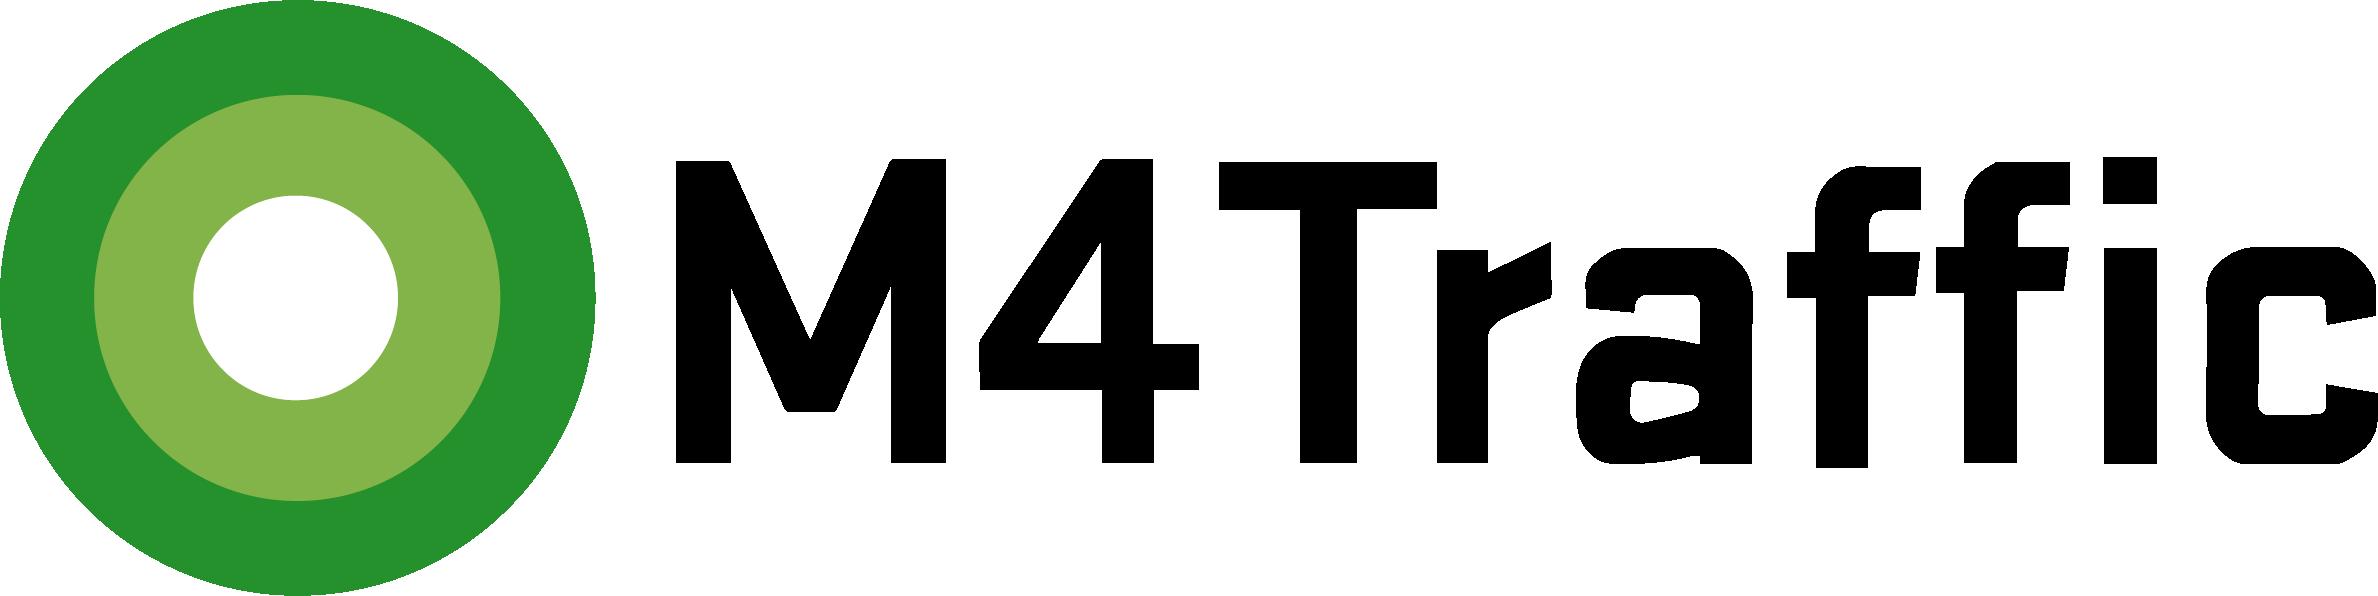 M4traffic